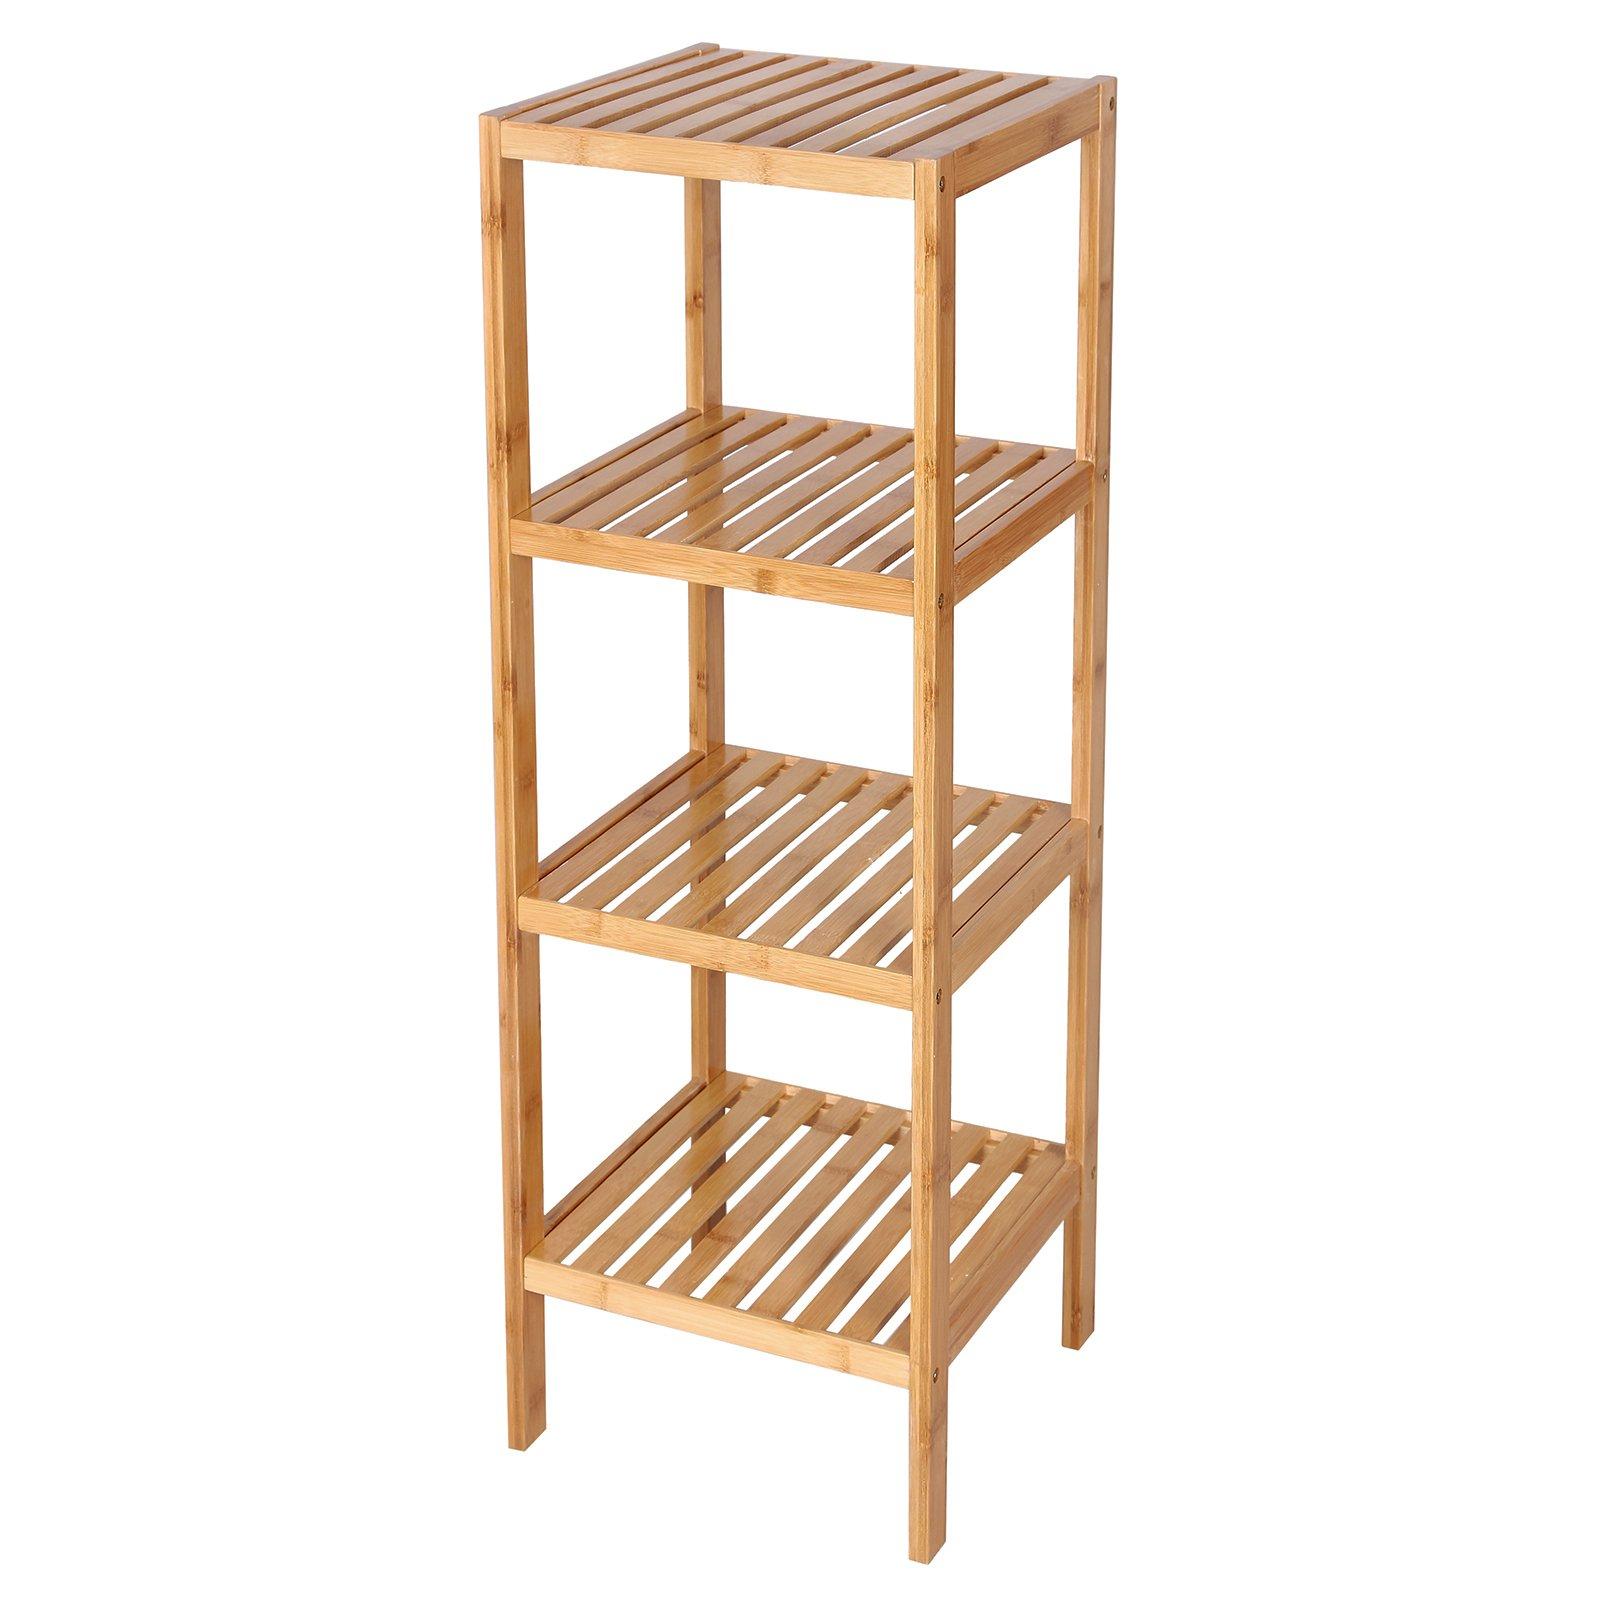 SONGMICS 100% Bamboo Bathroom Shelf 4-Tier Multifunctional Storage Rack Shelving Unit 38.6 x 13 x 13 Inches UBCB54Y by SONGMICS